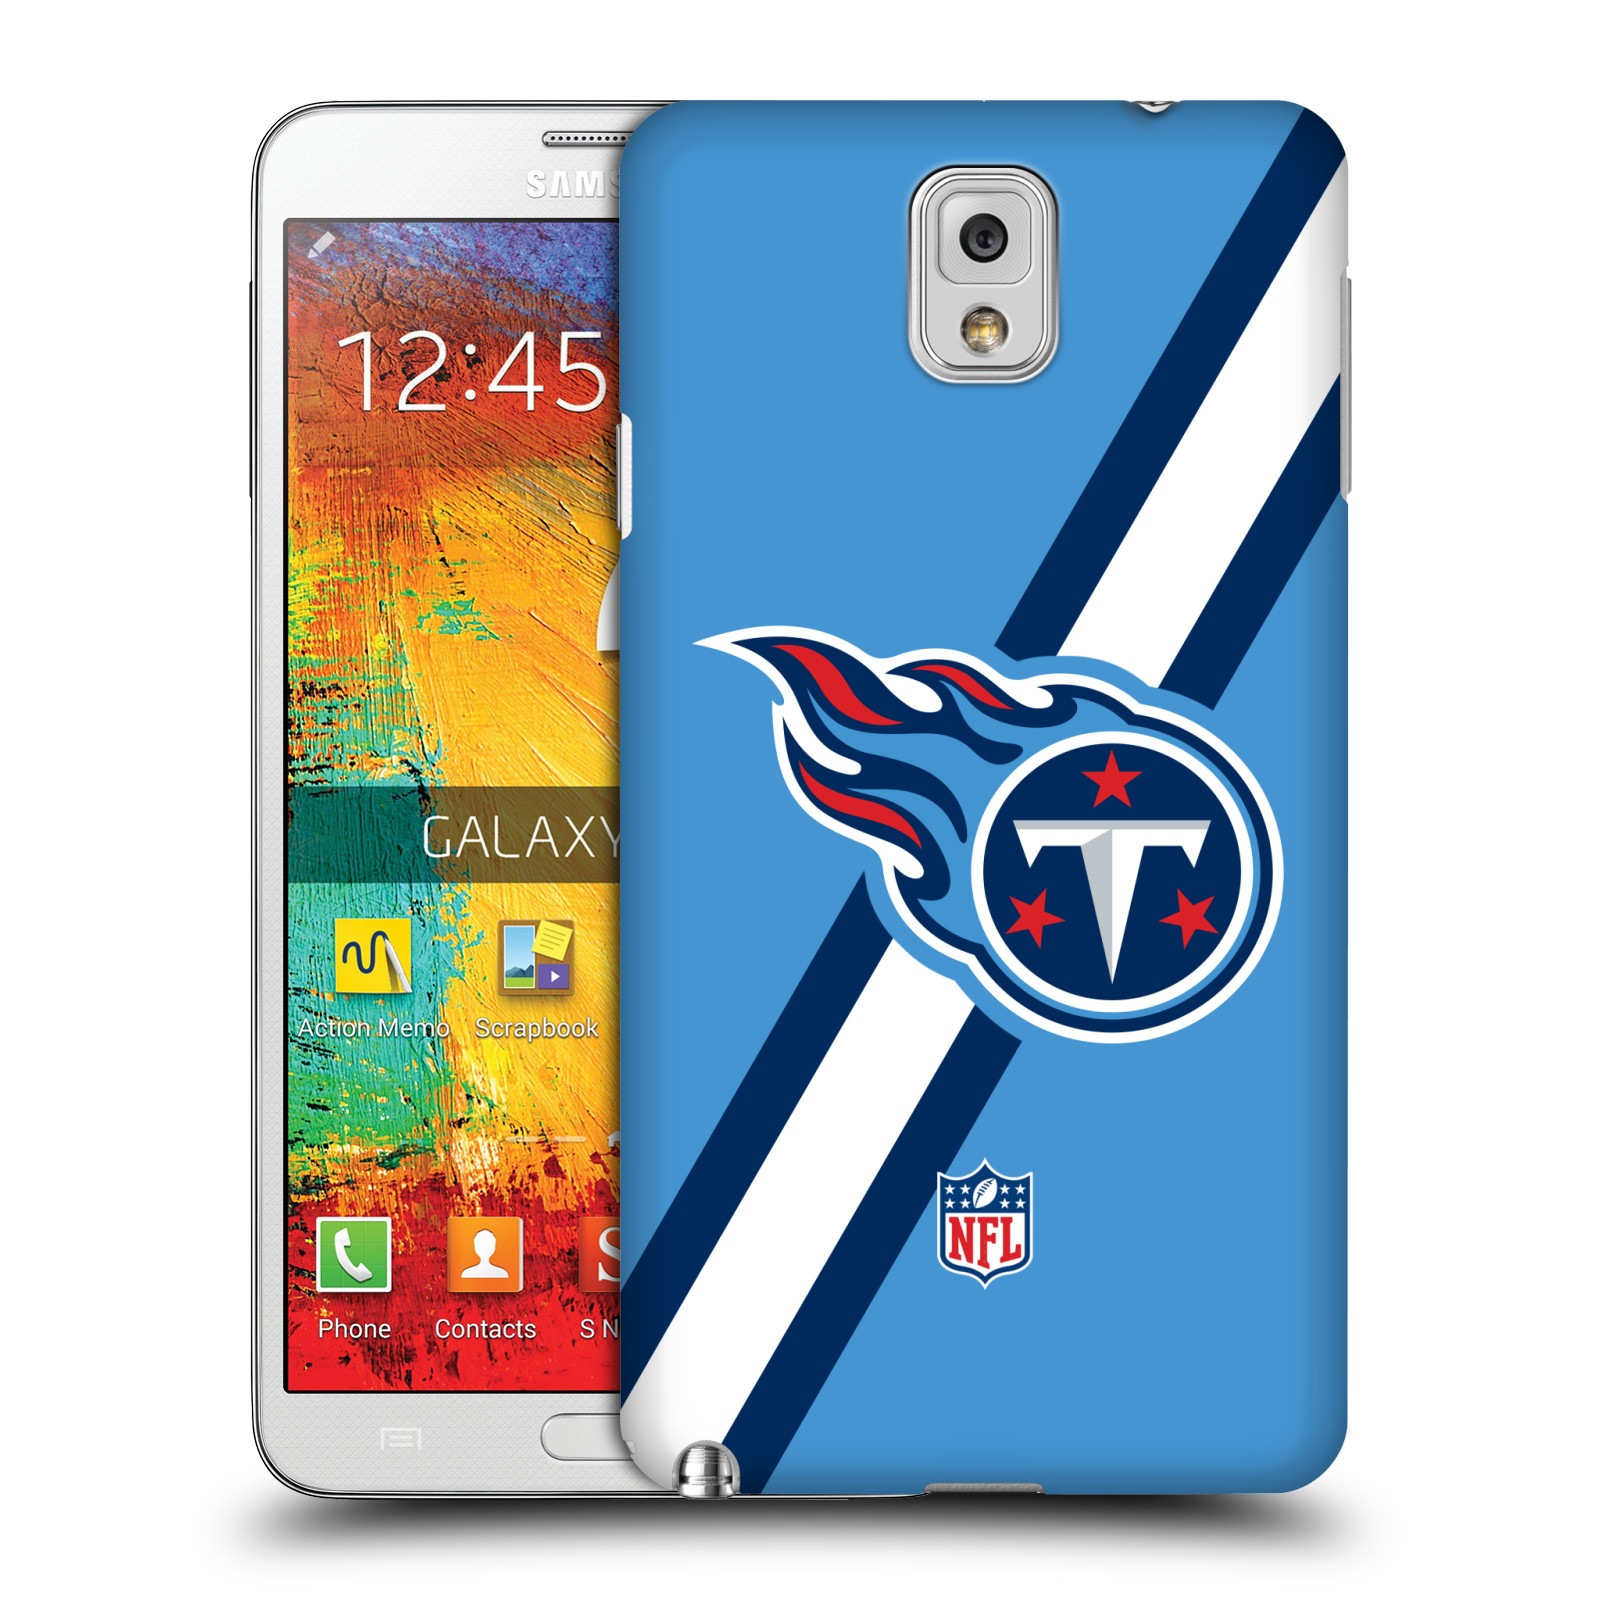 OFFICIAL-NFL-TENNESSEE-TITANS-LOGO-HARD-BACK-CASE-FOR-SAMSUNG-PHONES-2